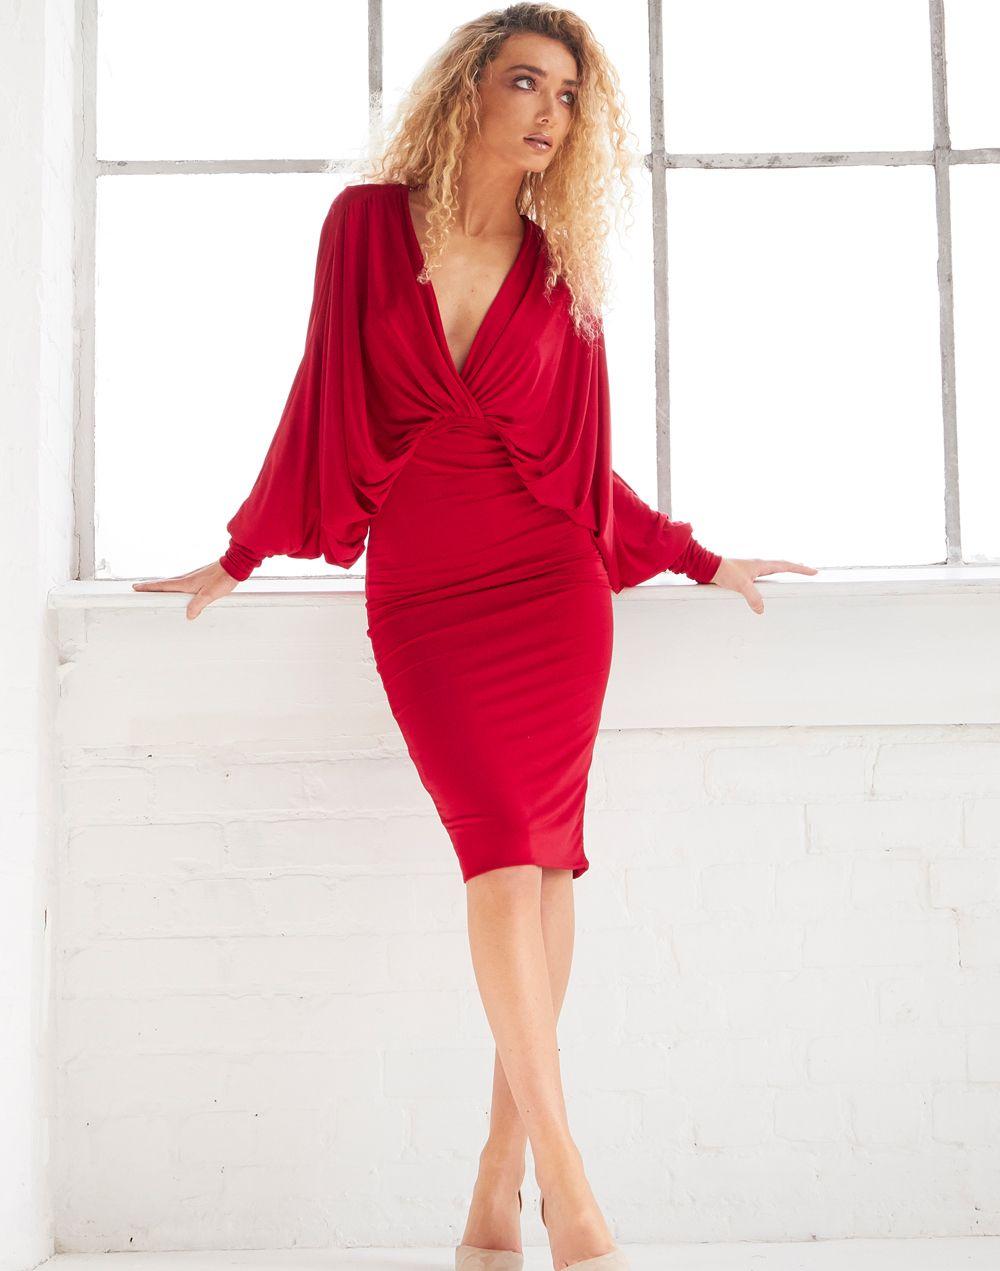 2b516e93bf Impresionante vestido rojo de corete midi con mangas murciélago. Vestido de  fiesta de corte midi